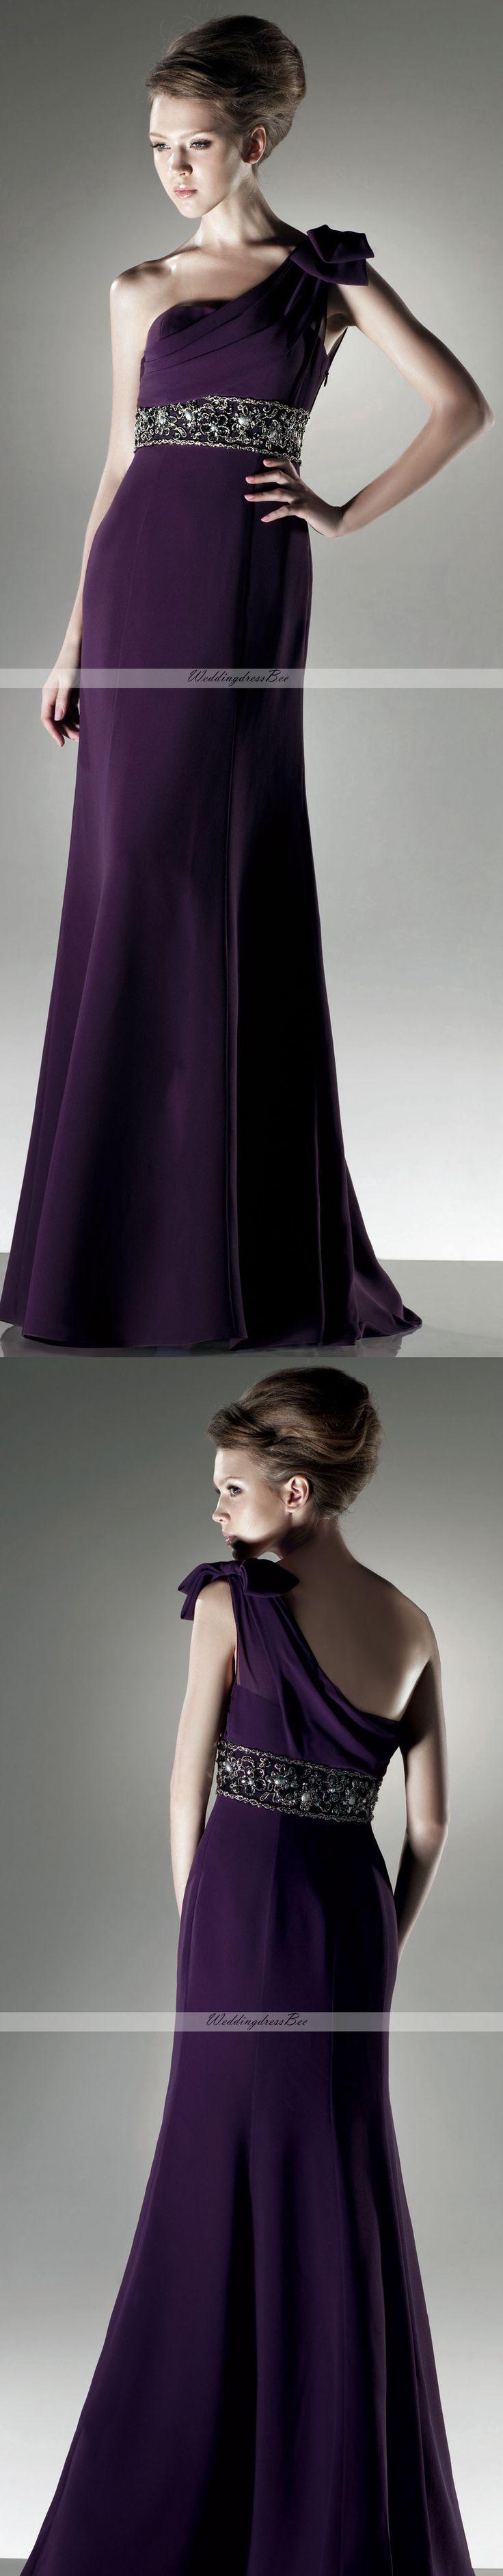 Modern One shoulder A-line chiffon dress